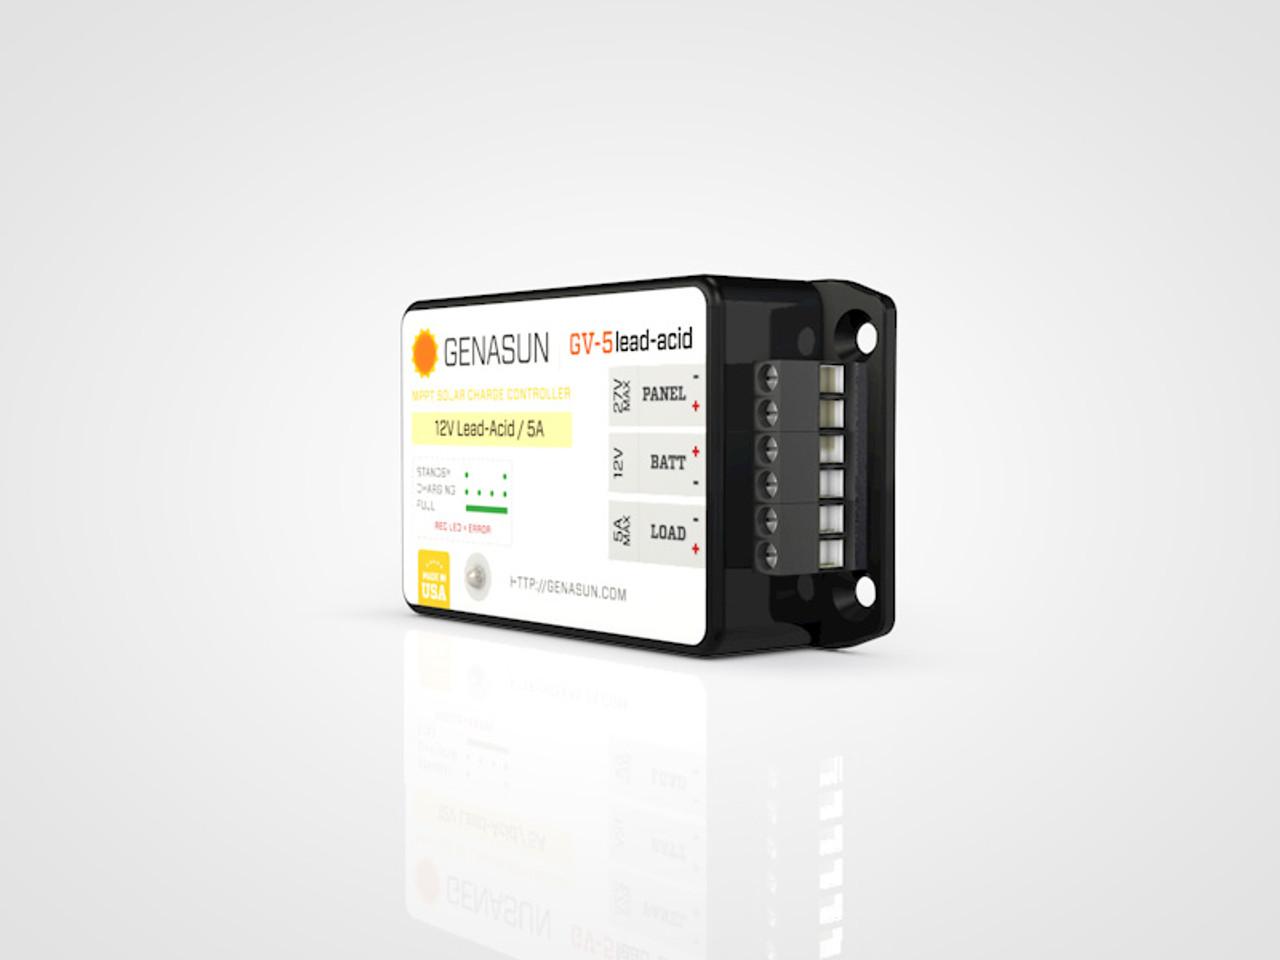 GV-5 | 65W 5A Genasun MPPT Solar Charge Controller - Pb - Right2